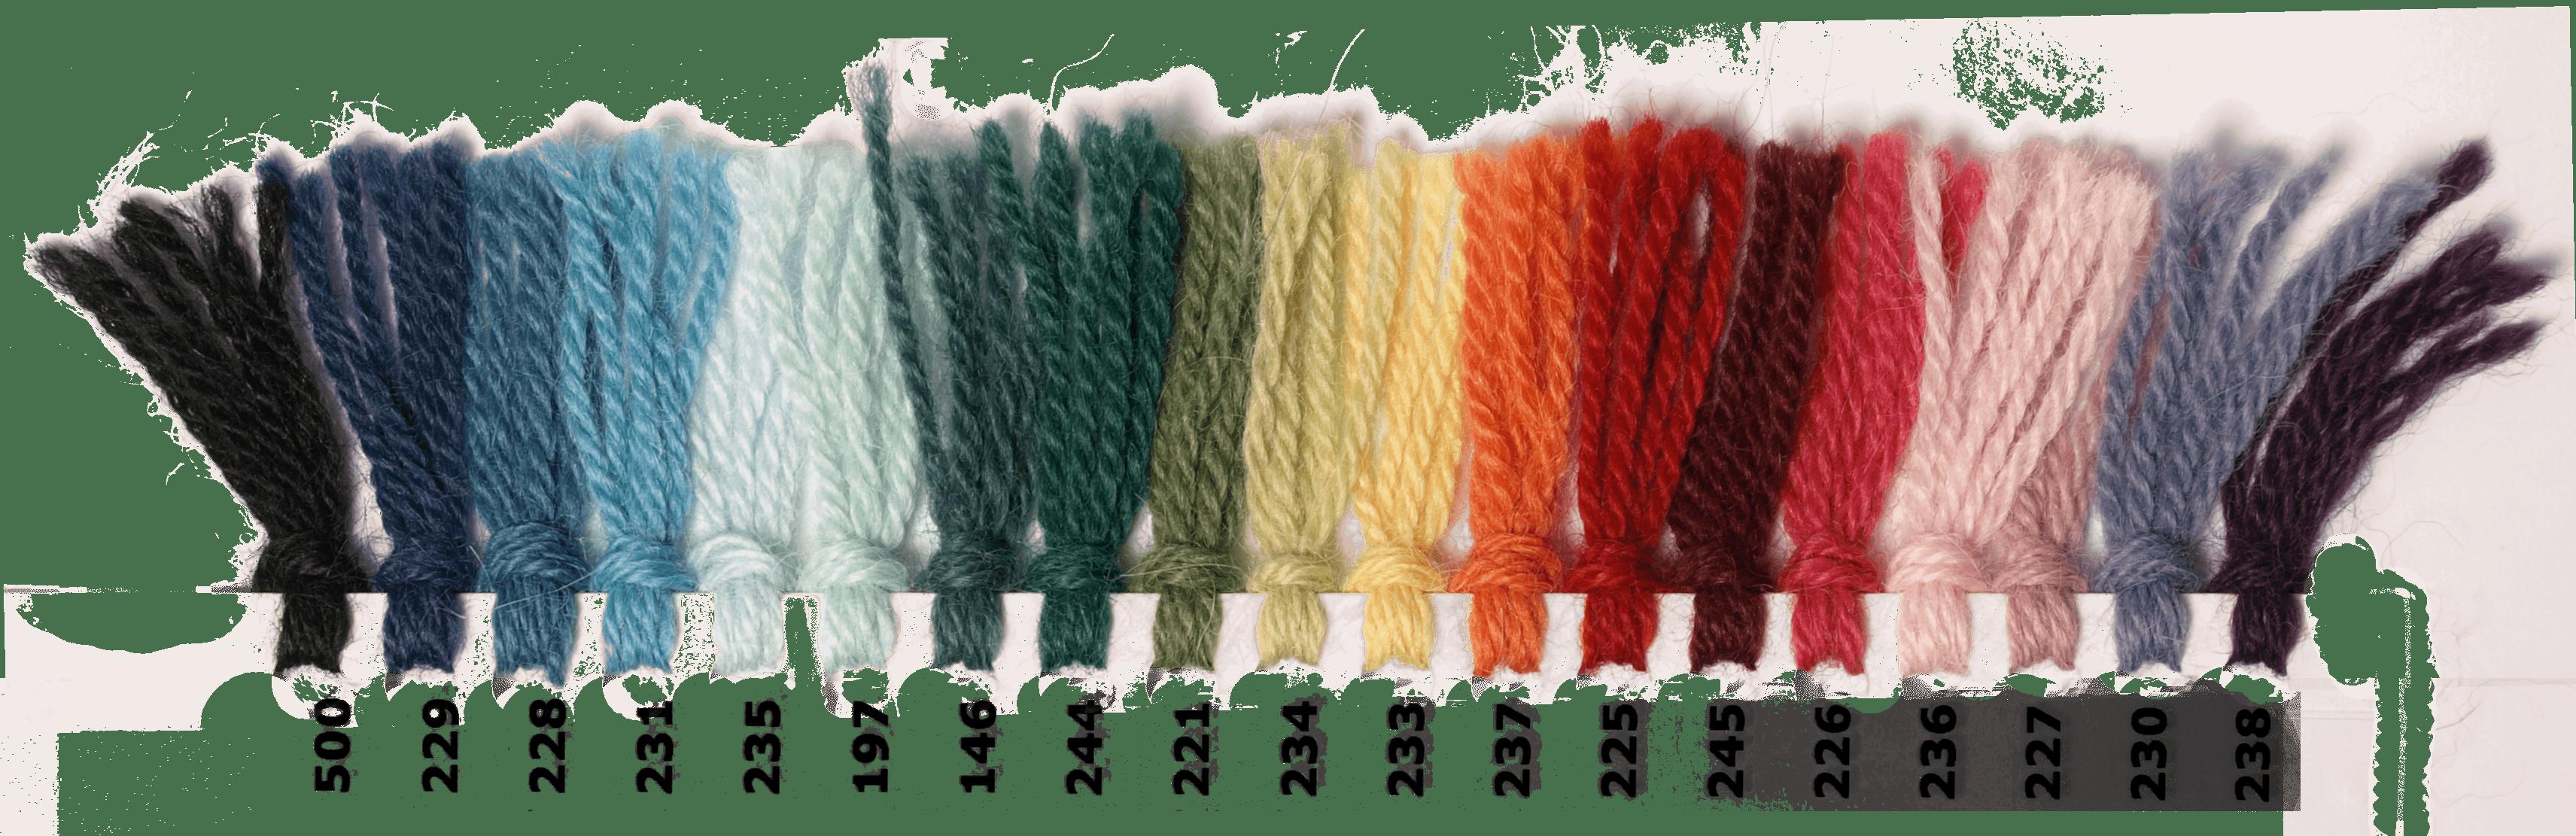 Indiecita-farvekort-3